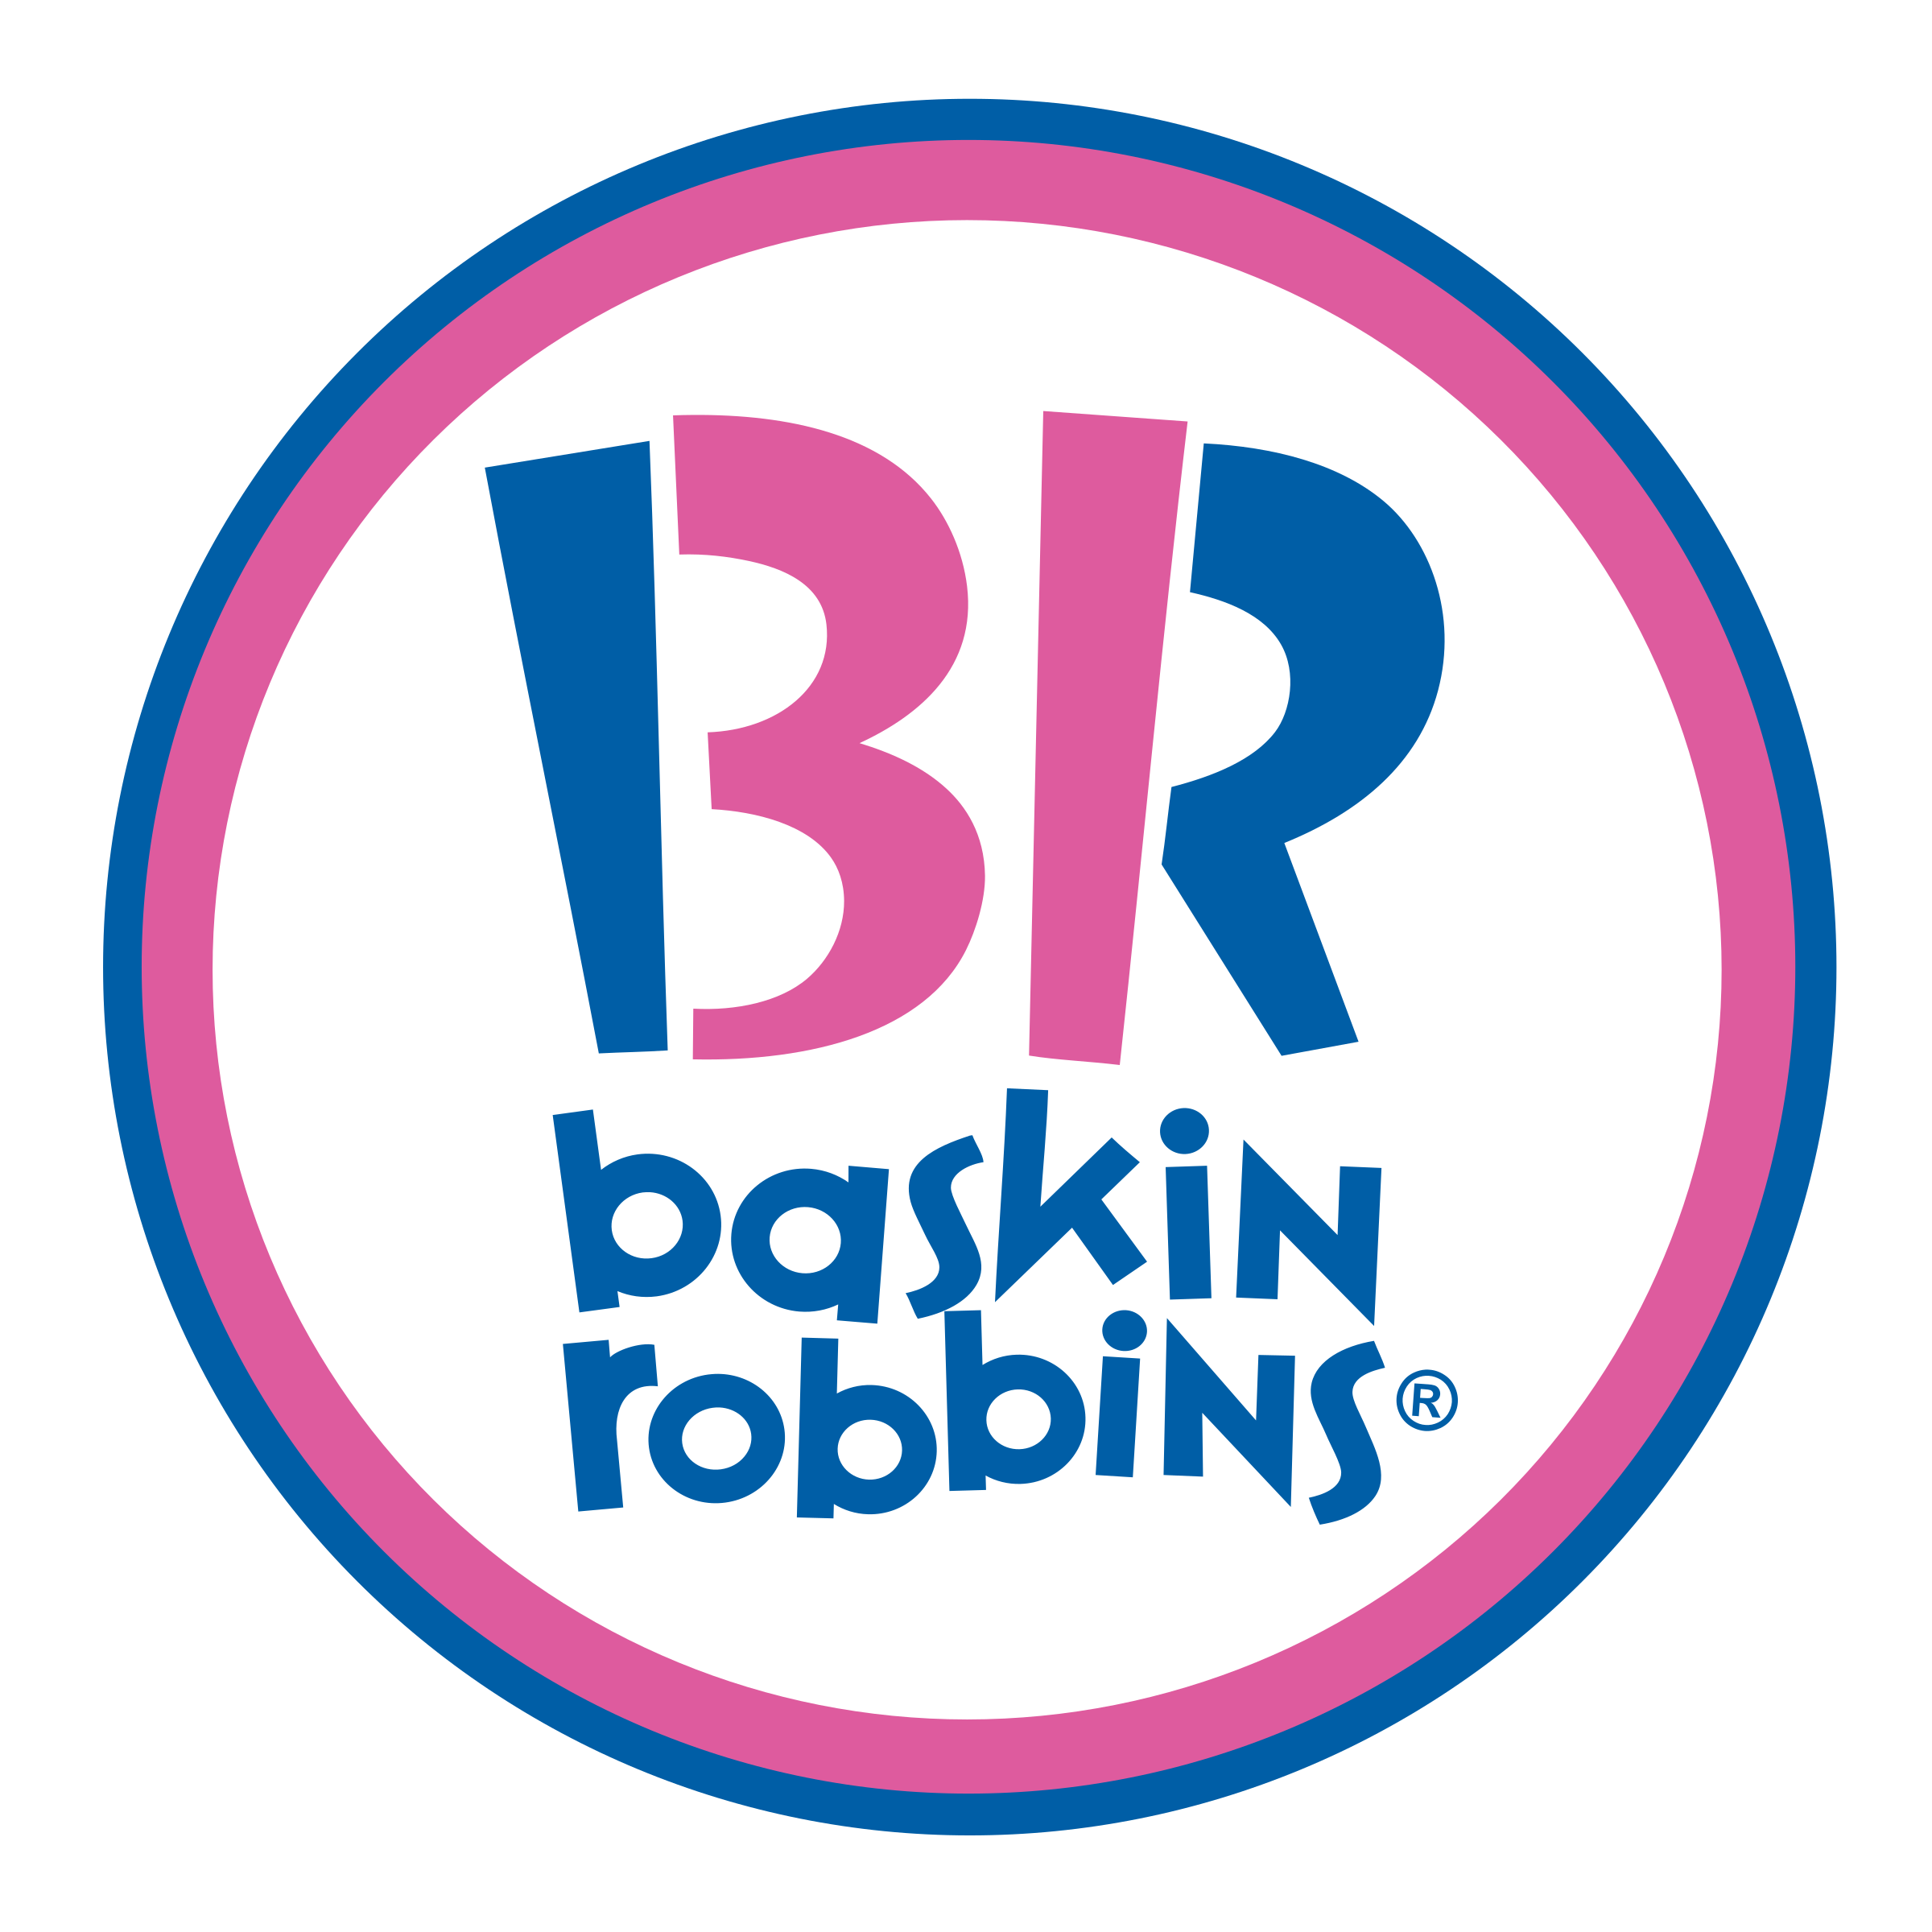 baskin-robbins-logo-png-transparent@2x.png